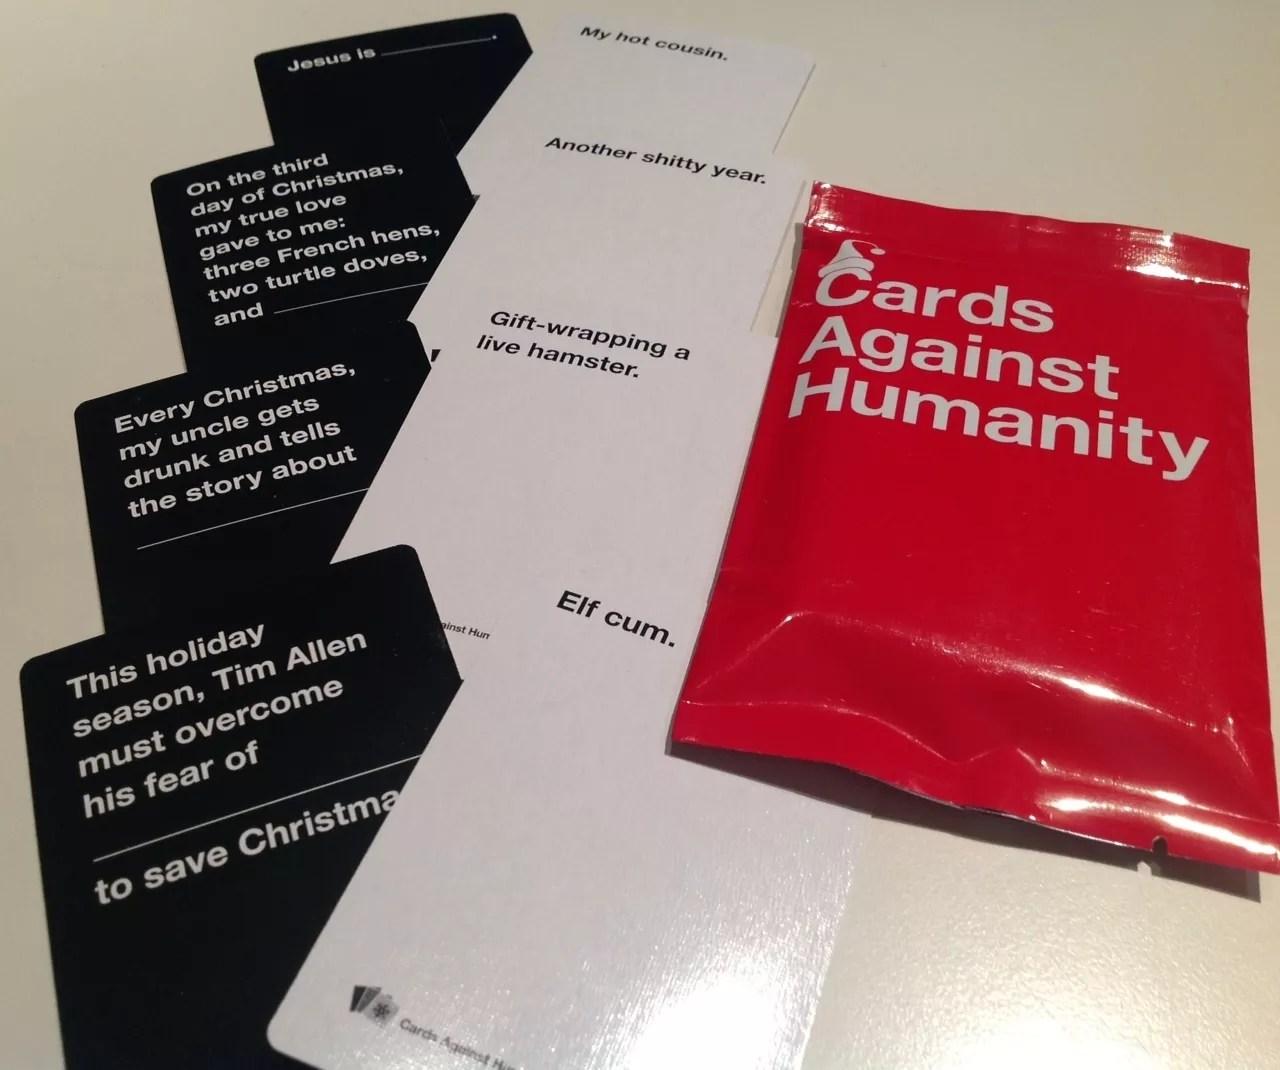 Image of: Nickelback Wwwjobspapacom Callstevenscom Cards Against Humanity Brings Us All Together Cards Against Humanity